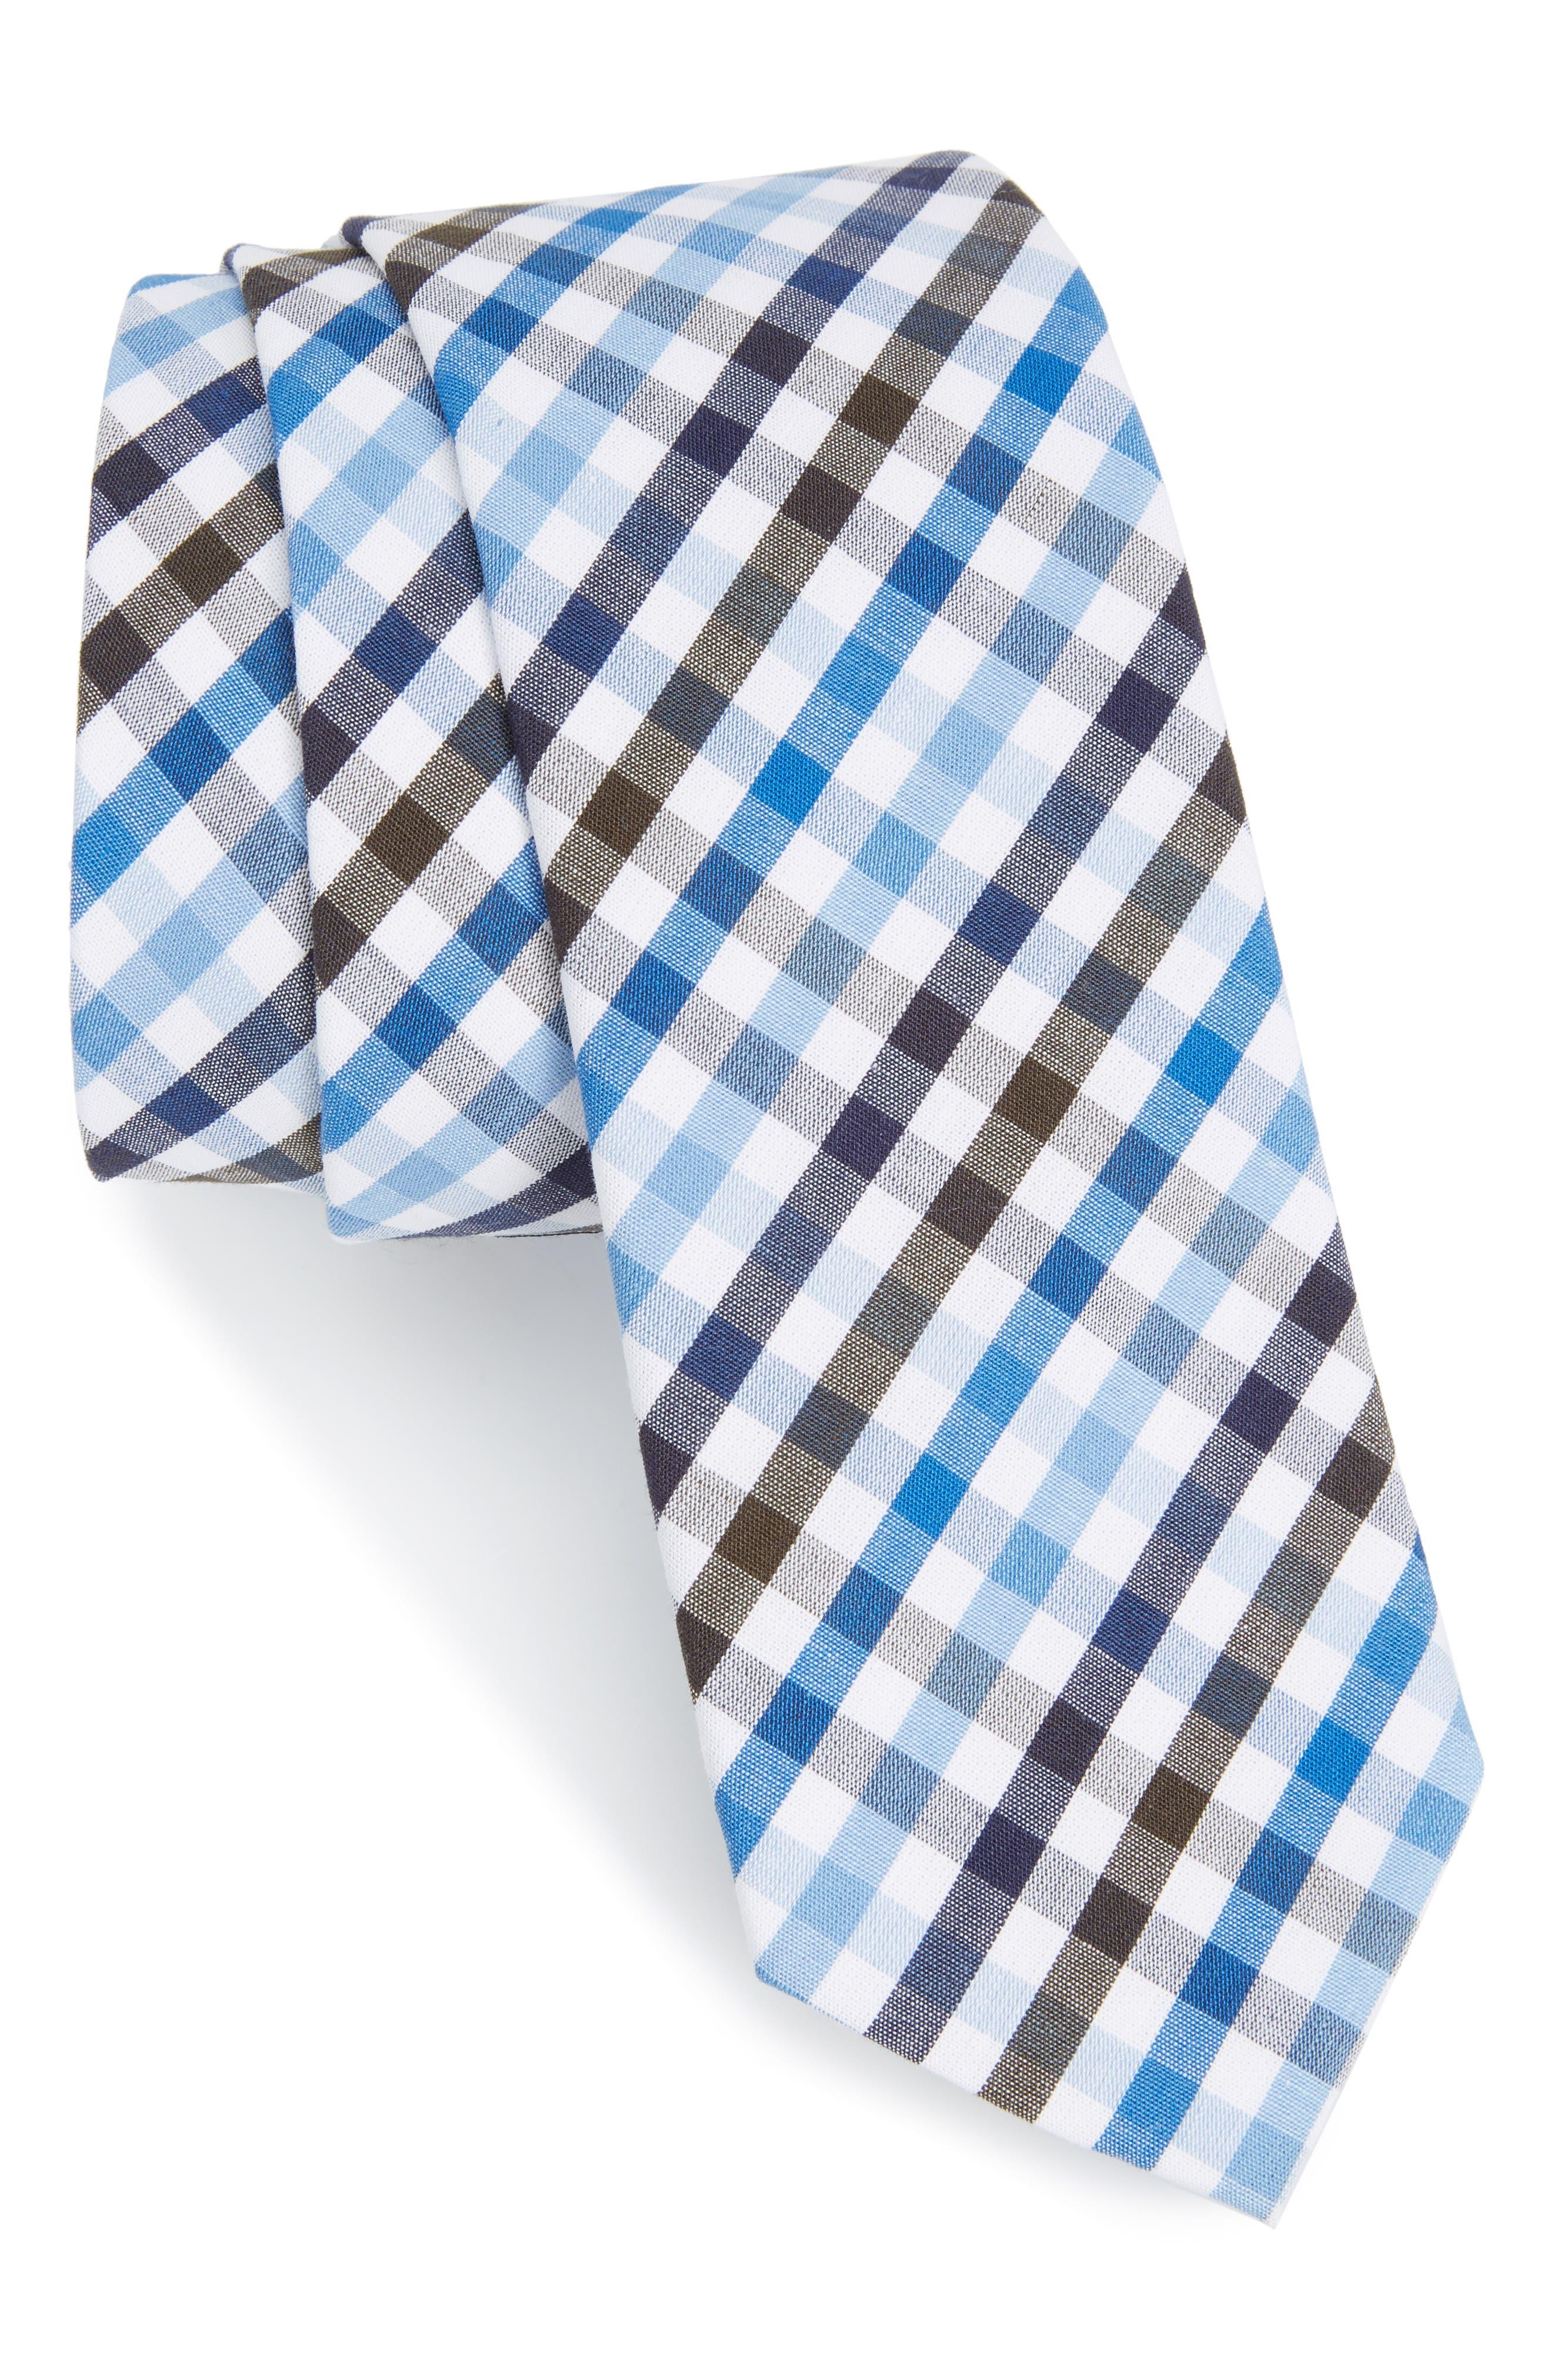 Nordstrom Men's Shop Charlie Plaid Cotton Skinny Tie